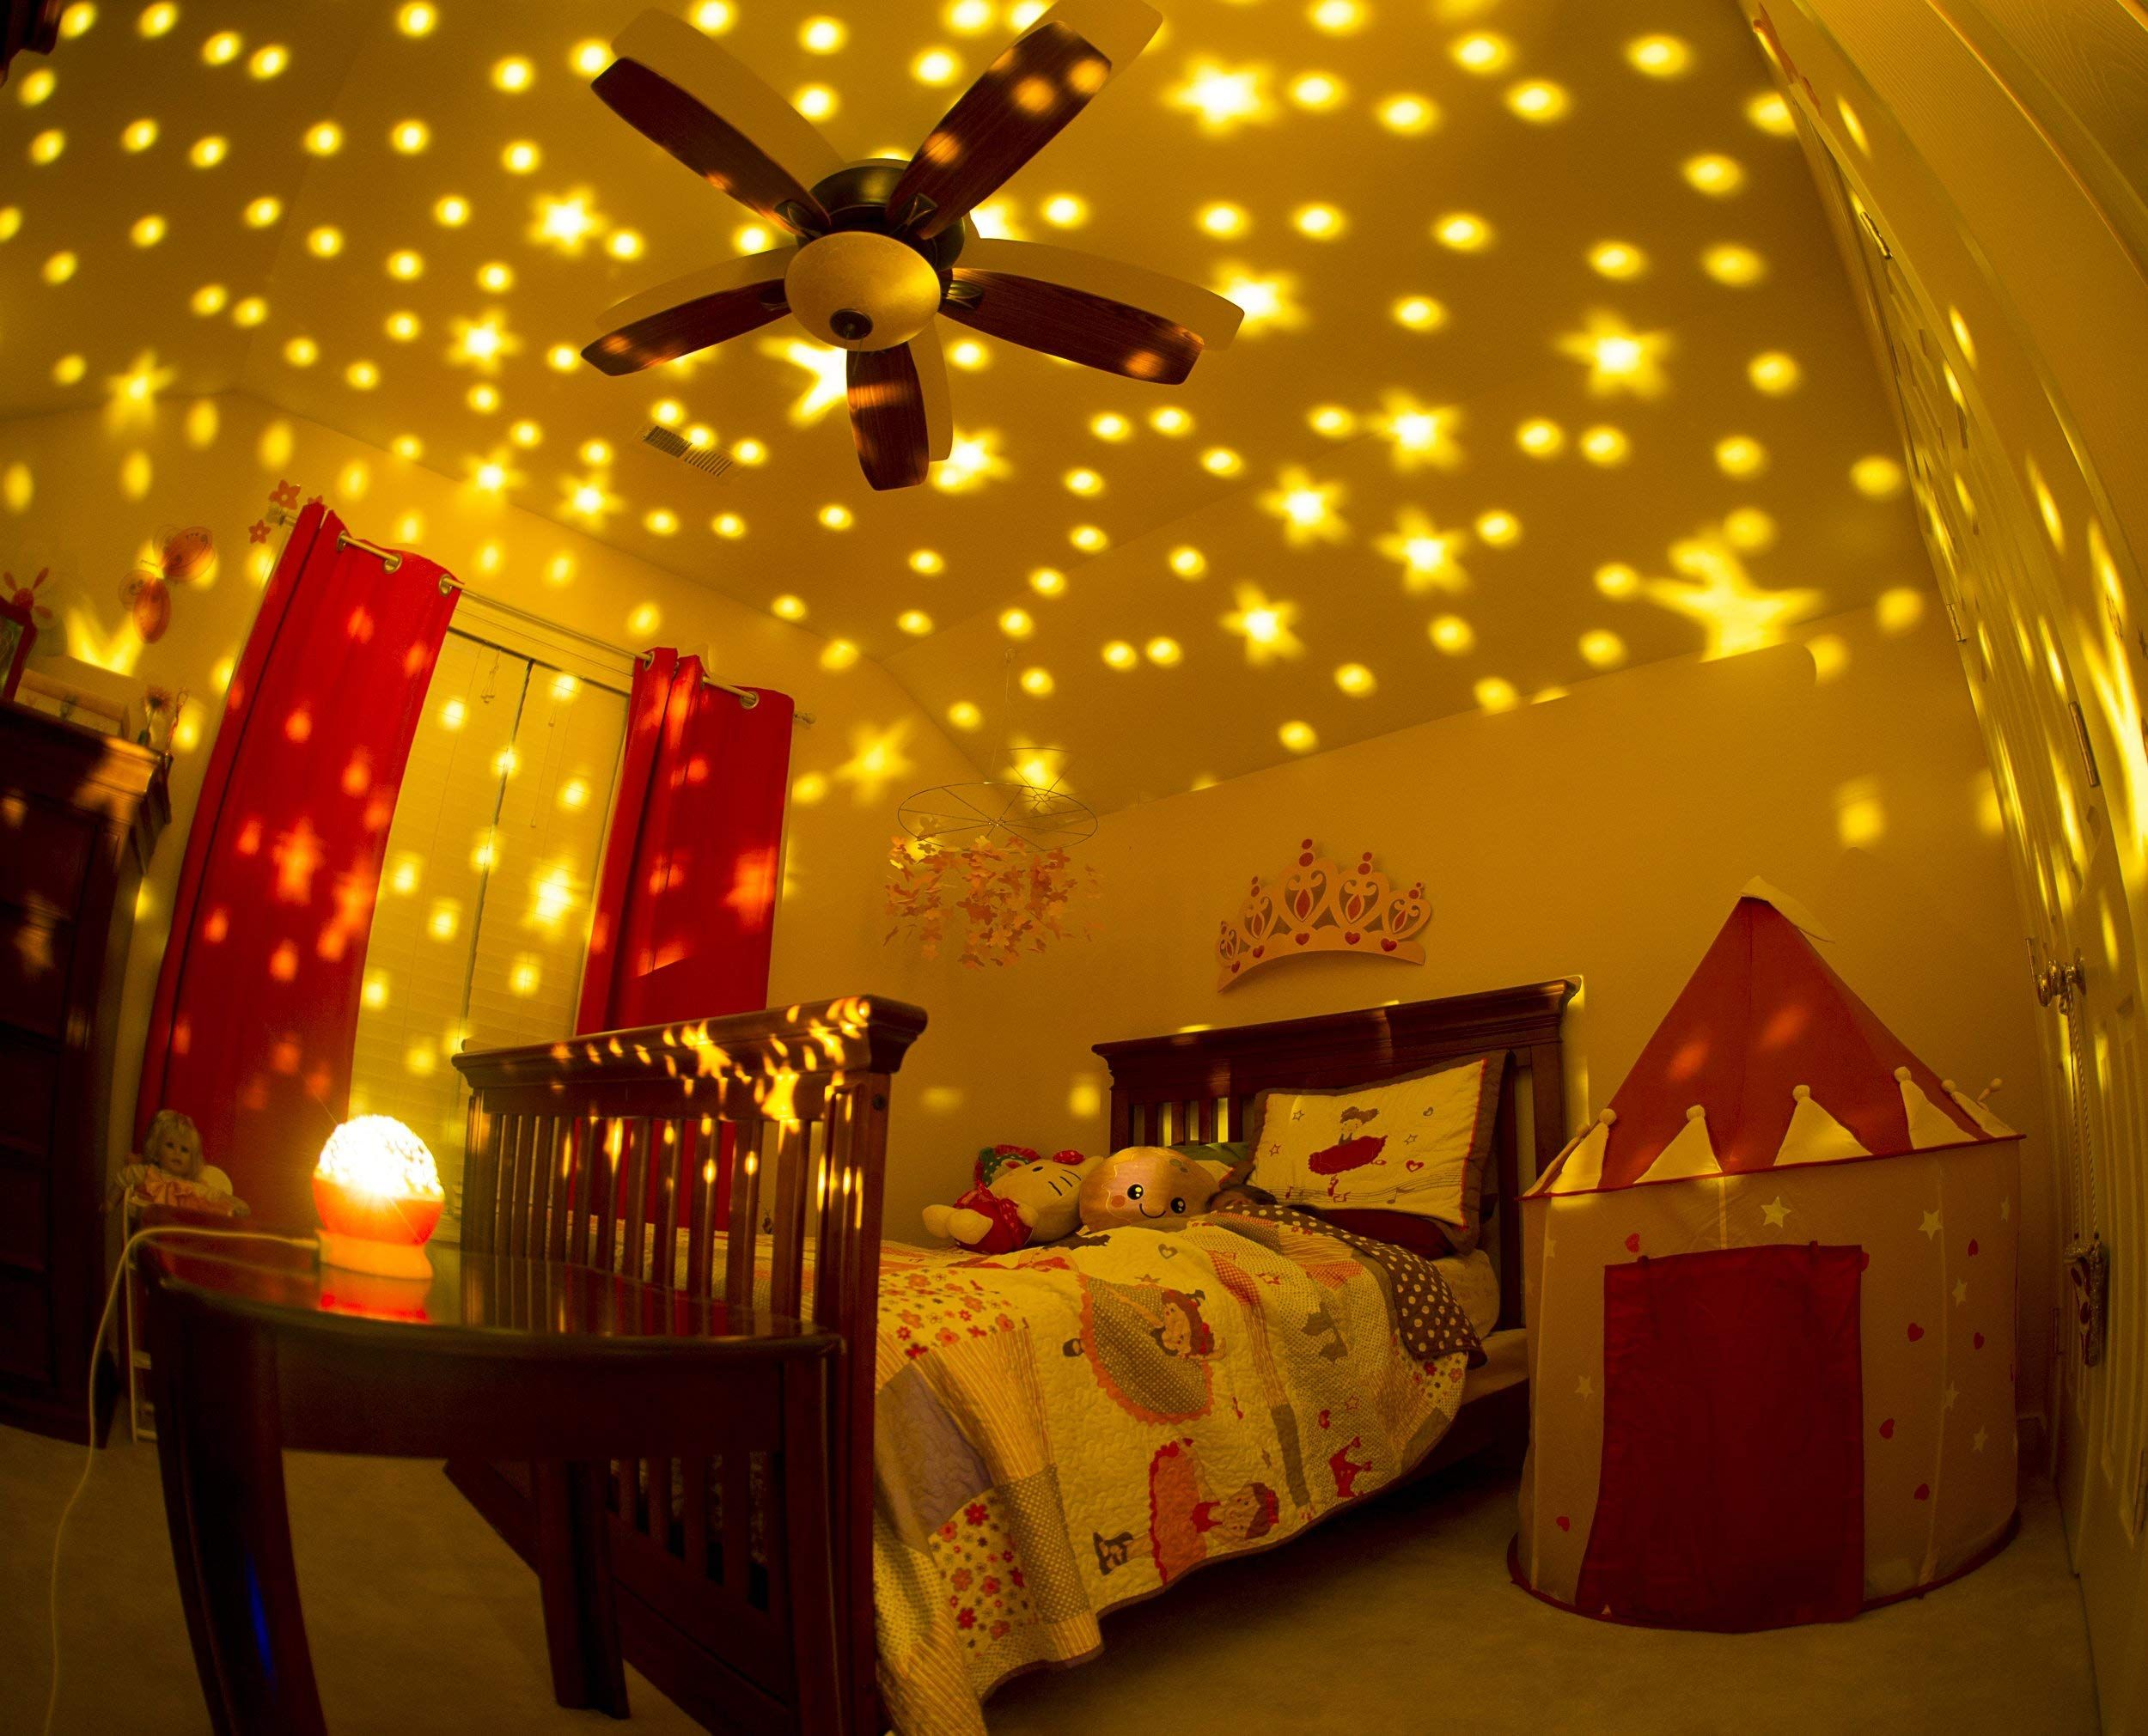 Kids Night Light For Girls Boys Babies Toddlers 4 Led Bulbs Moon Star Projector Night Light La Night Light Kids Christmas Gifts For Boys Girls Bedroom Lighting